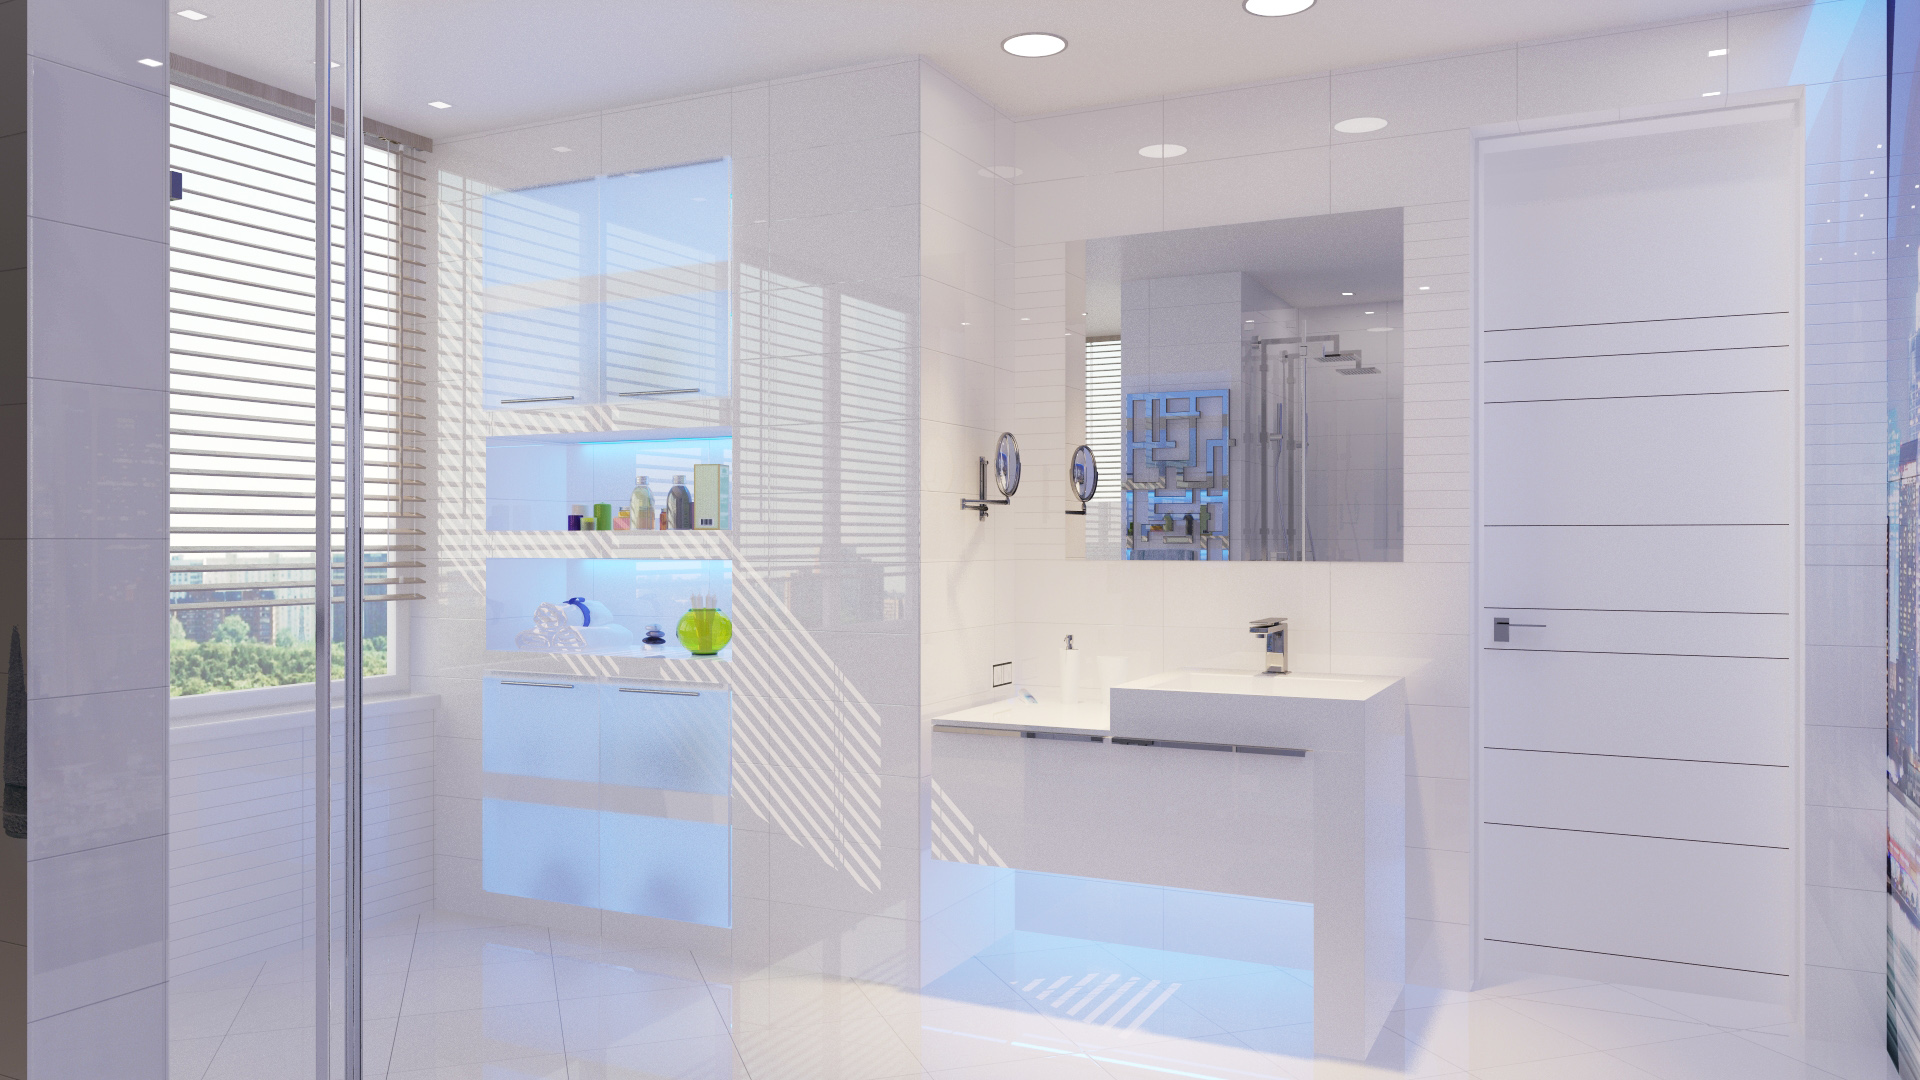 Minimalist bathroom interior design ideas